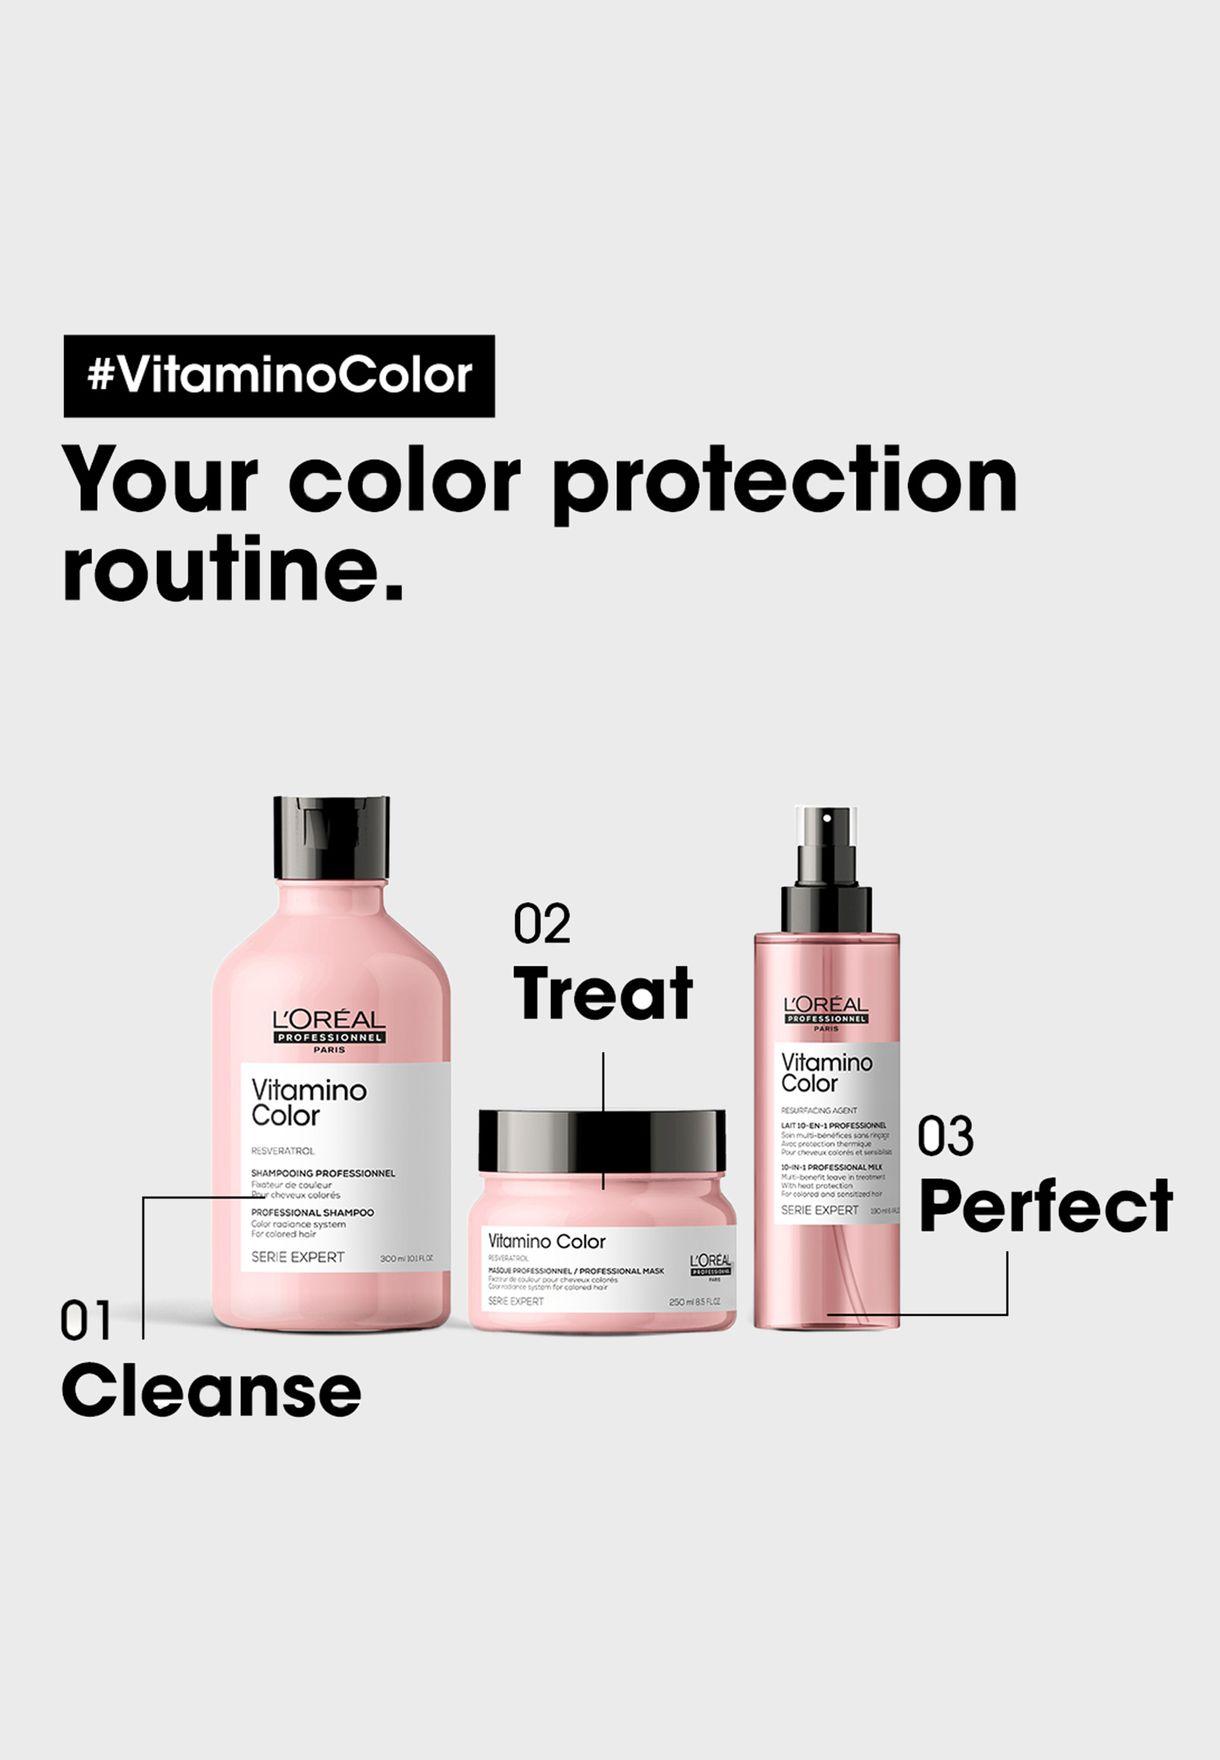 Serie Expert - Vitamino Color Masque